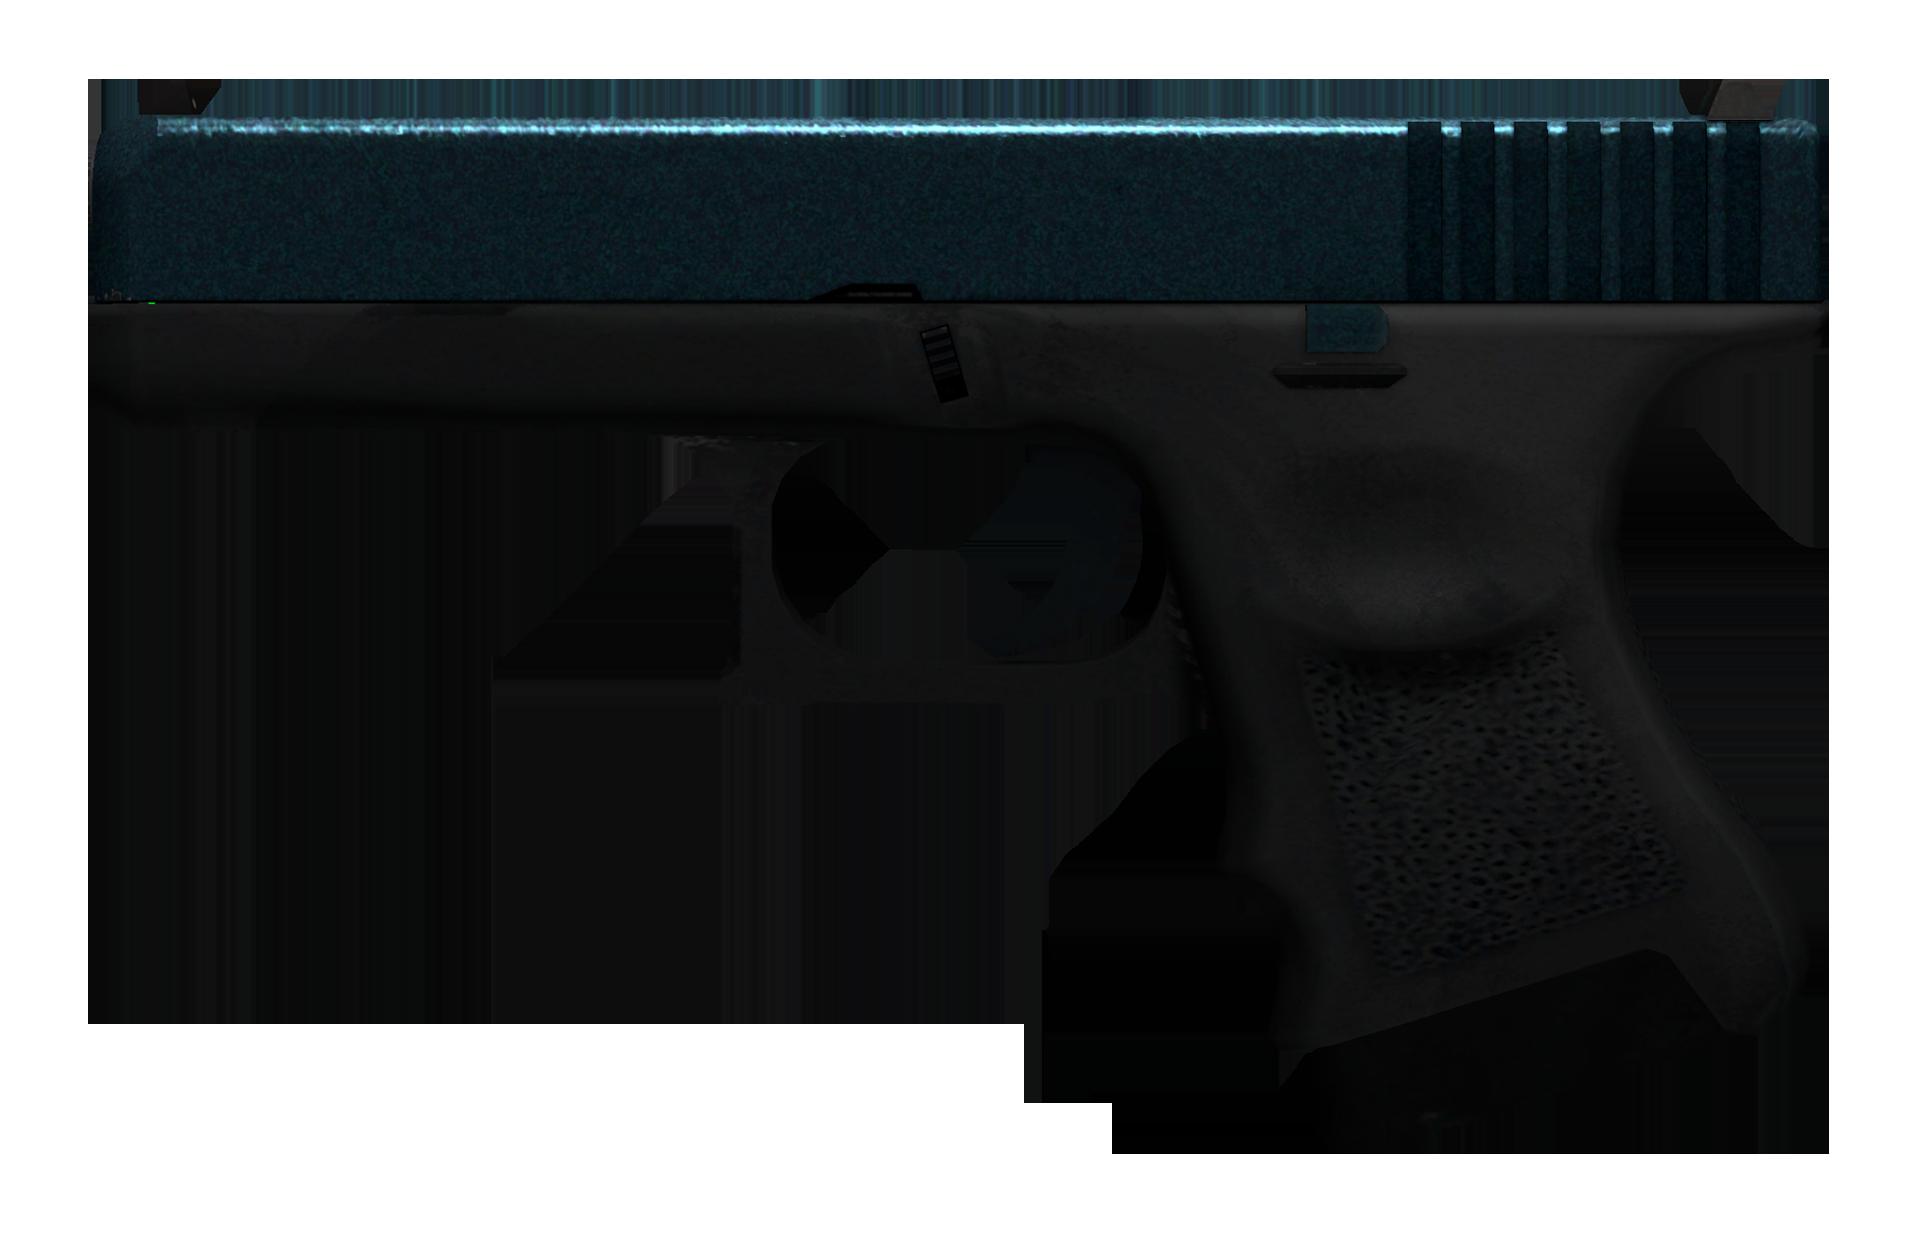 Glock-18 Twilight Galaxy Large Rendering